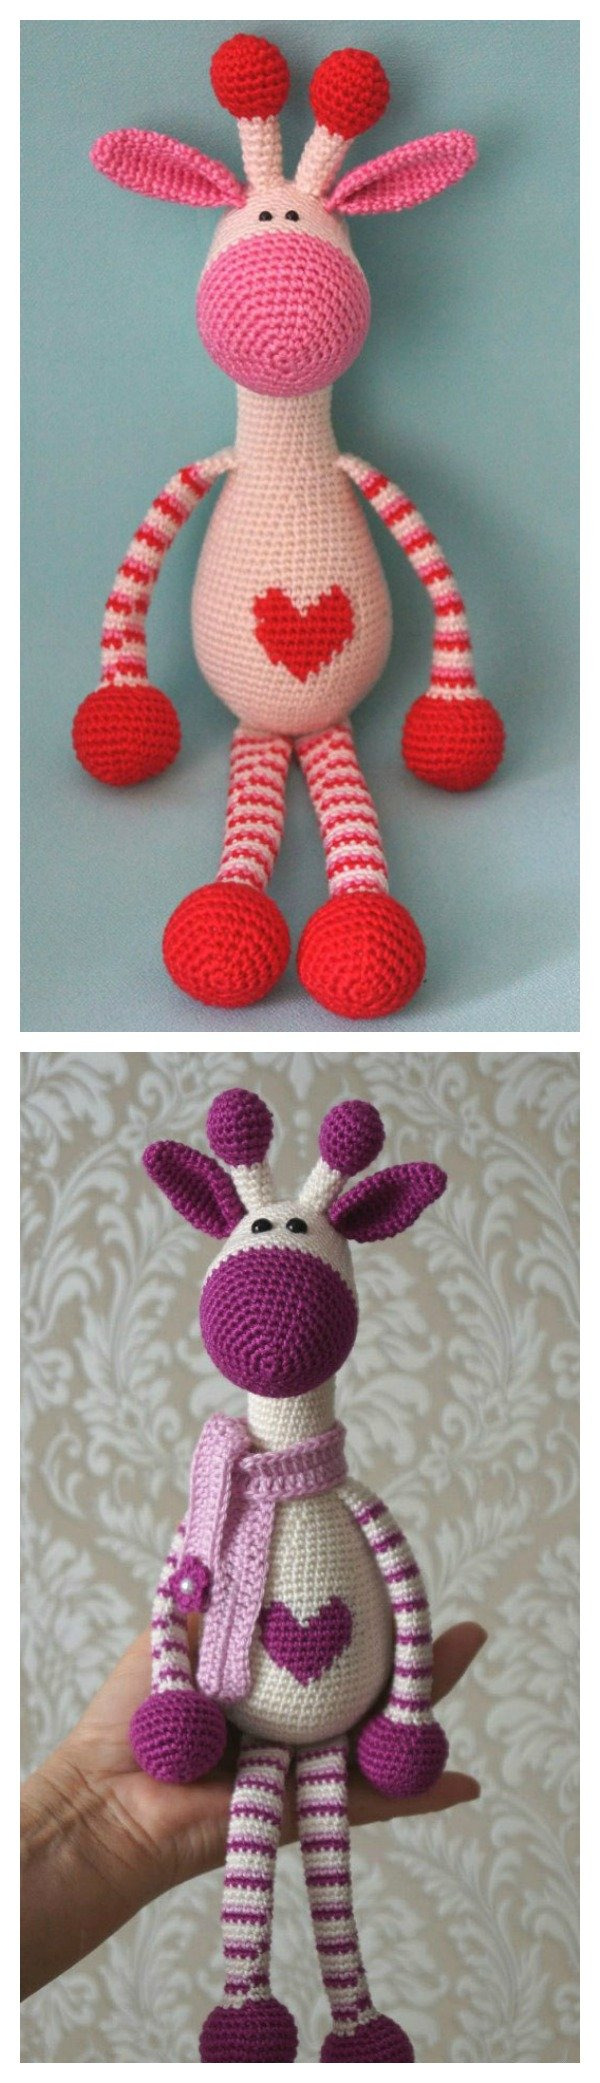 Amigurumi Giraffe Pattern Free : Adorable crochet hearty giraffe amigurumi free pattern